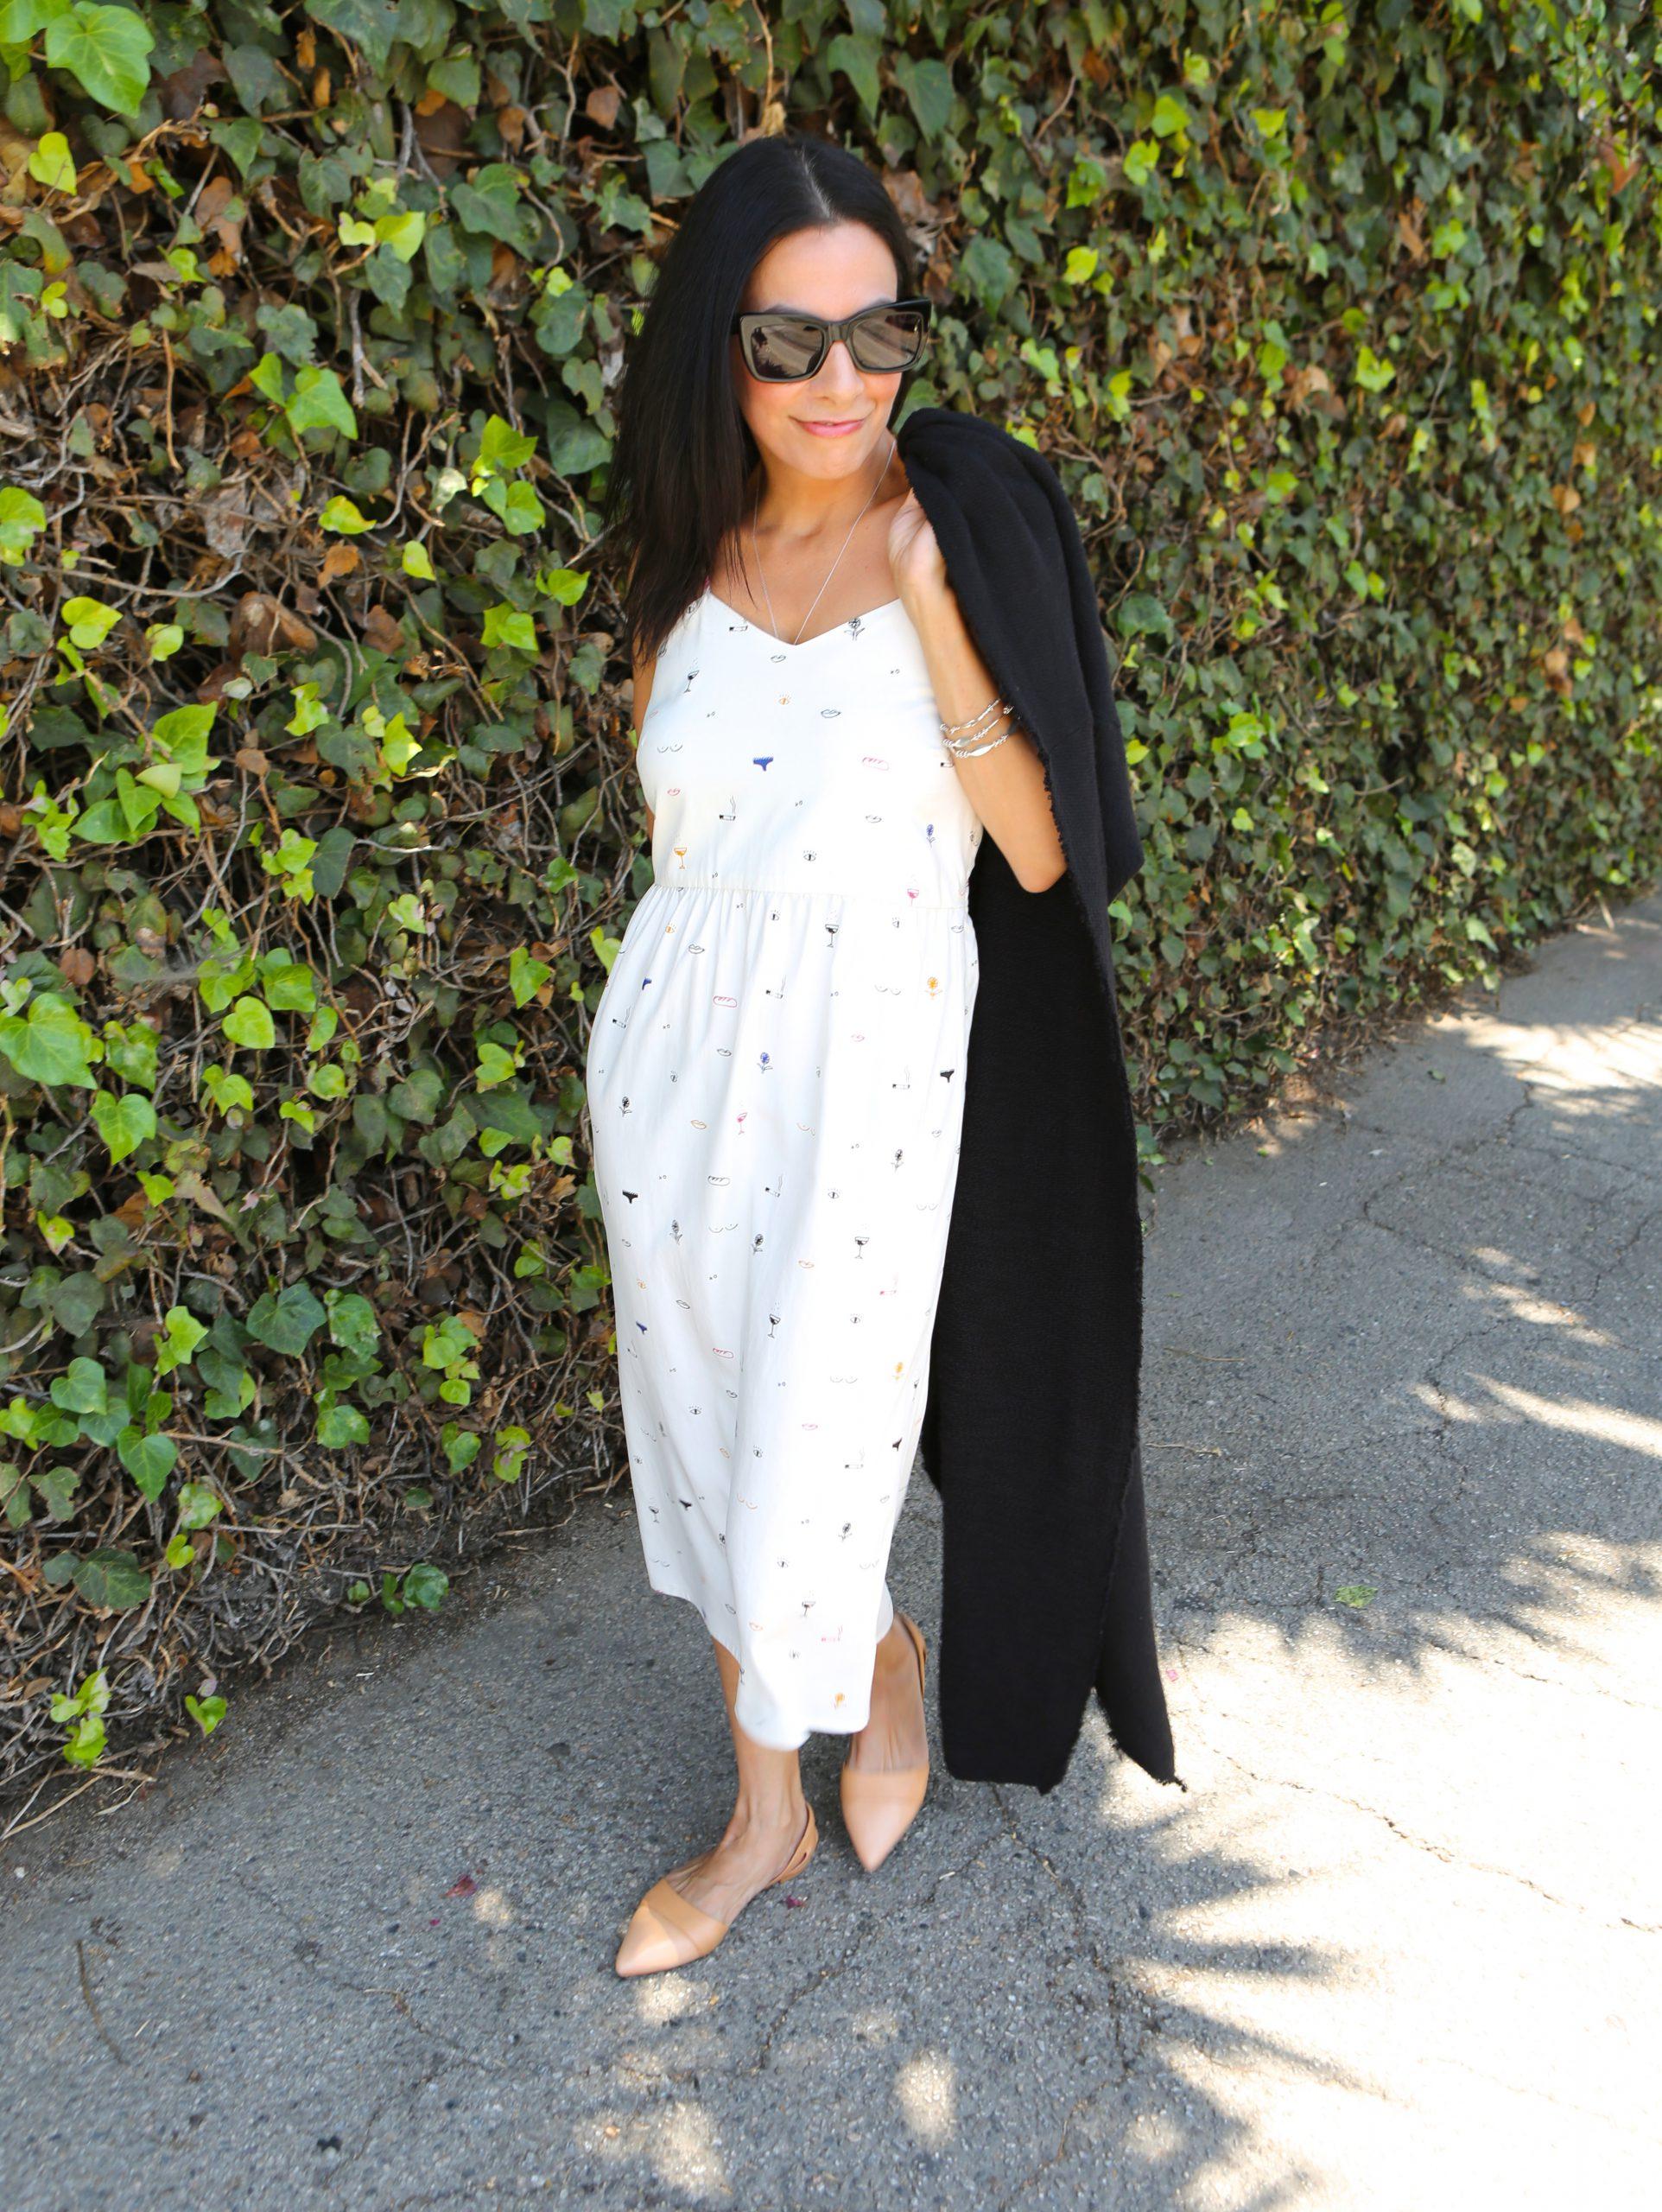 Casual Friday Dress Code - Loup NYC Dress